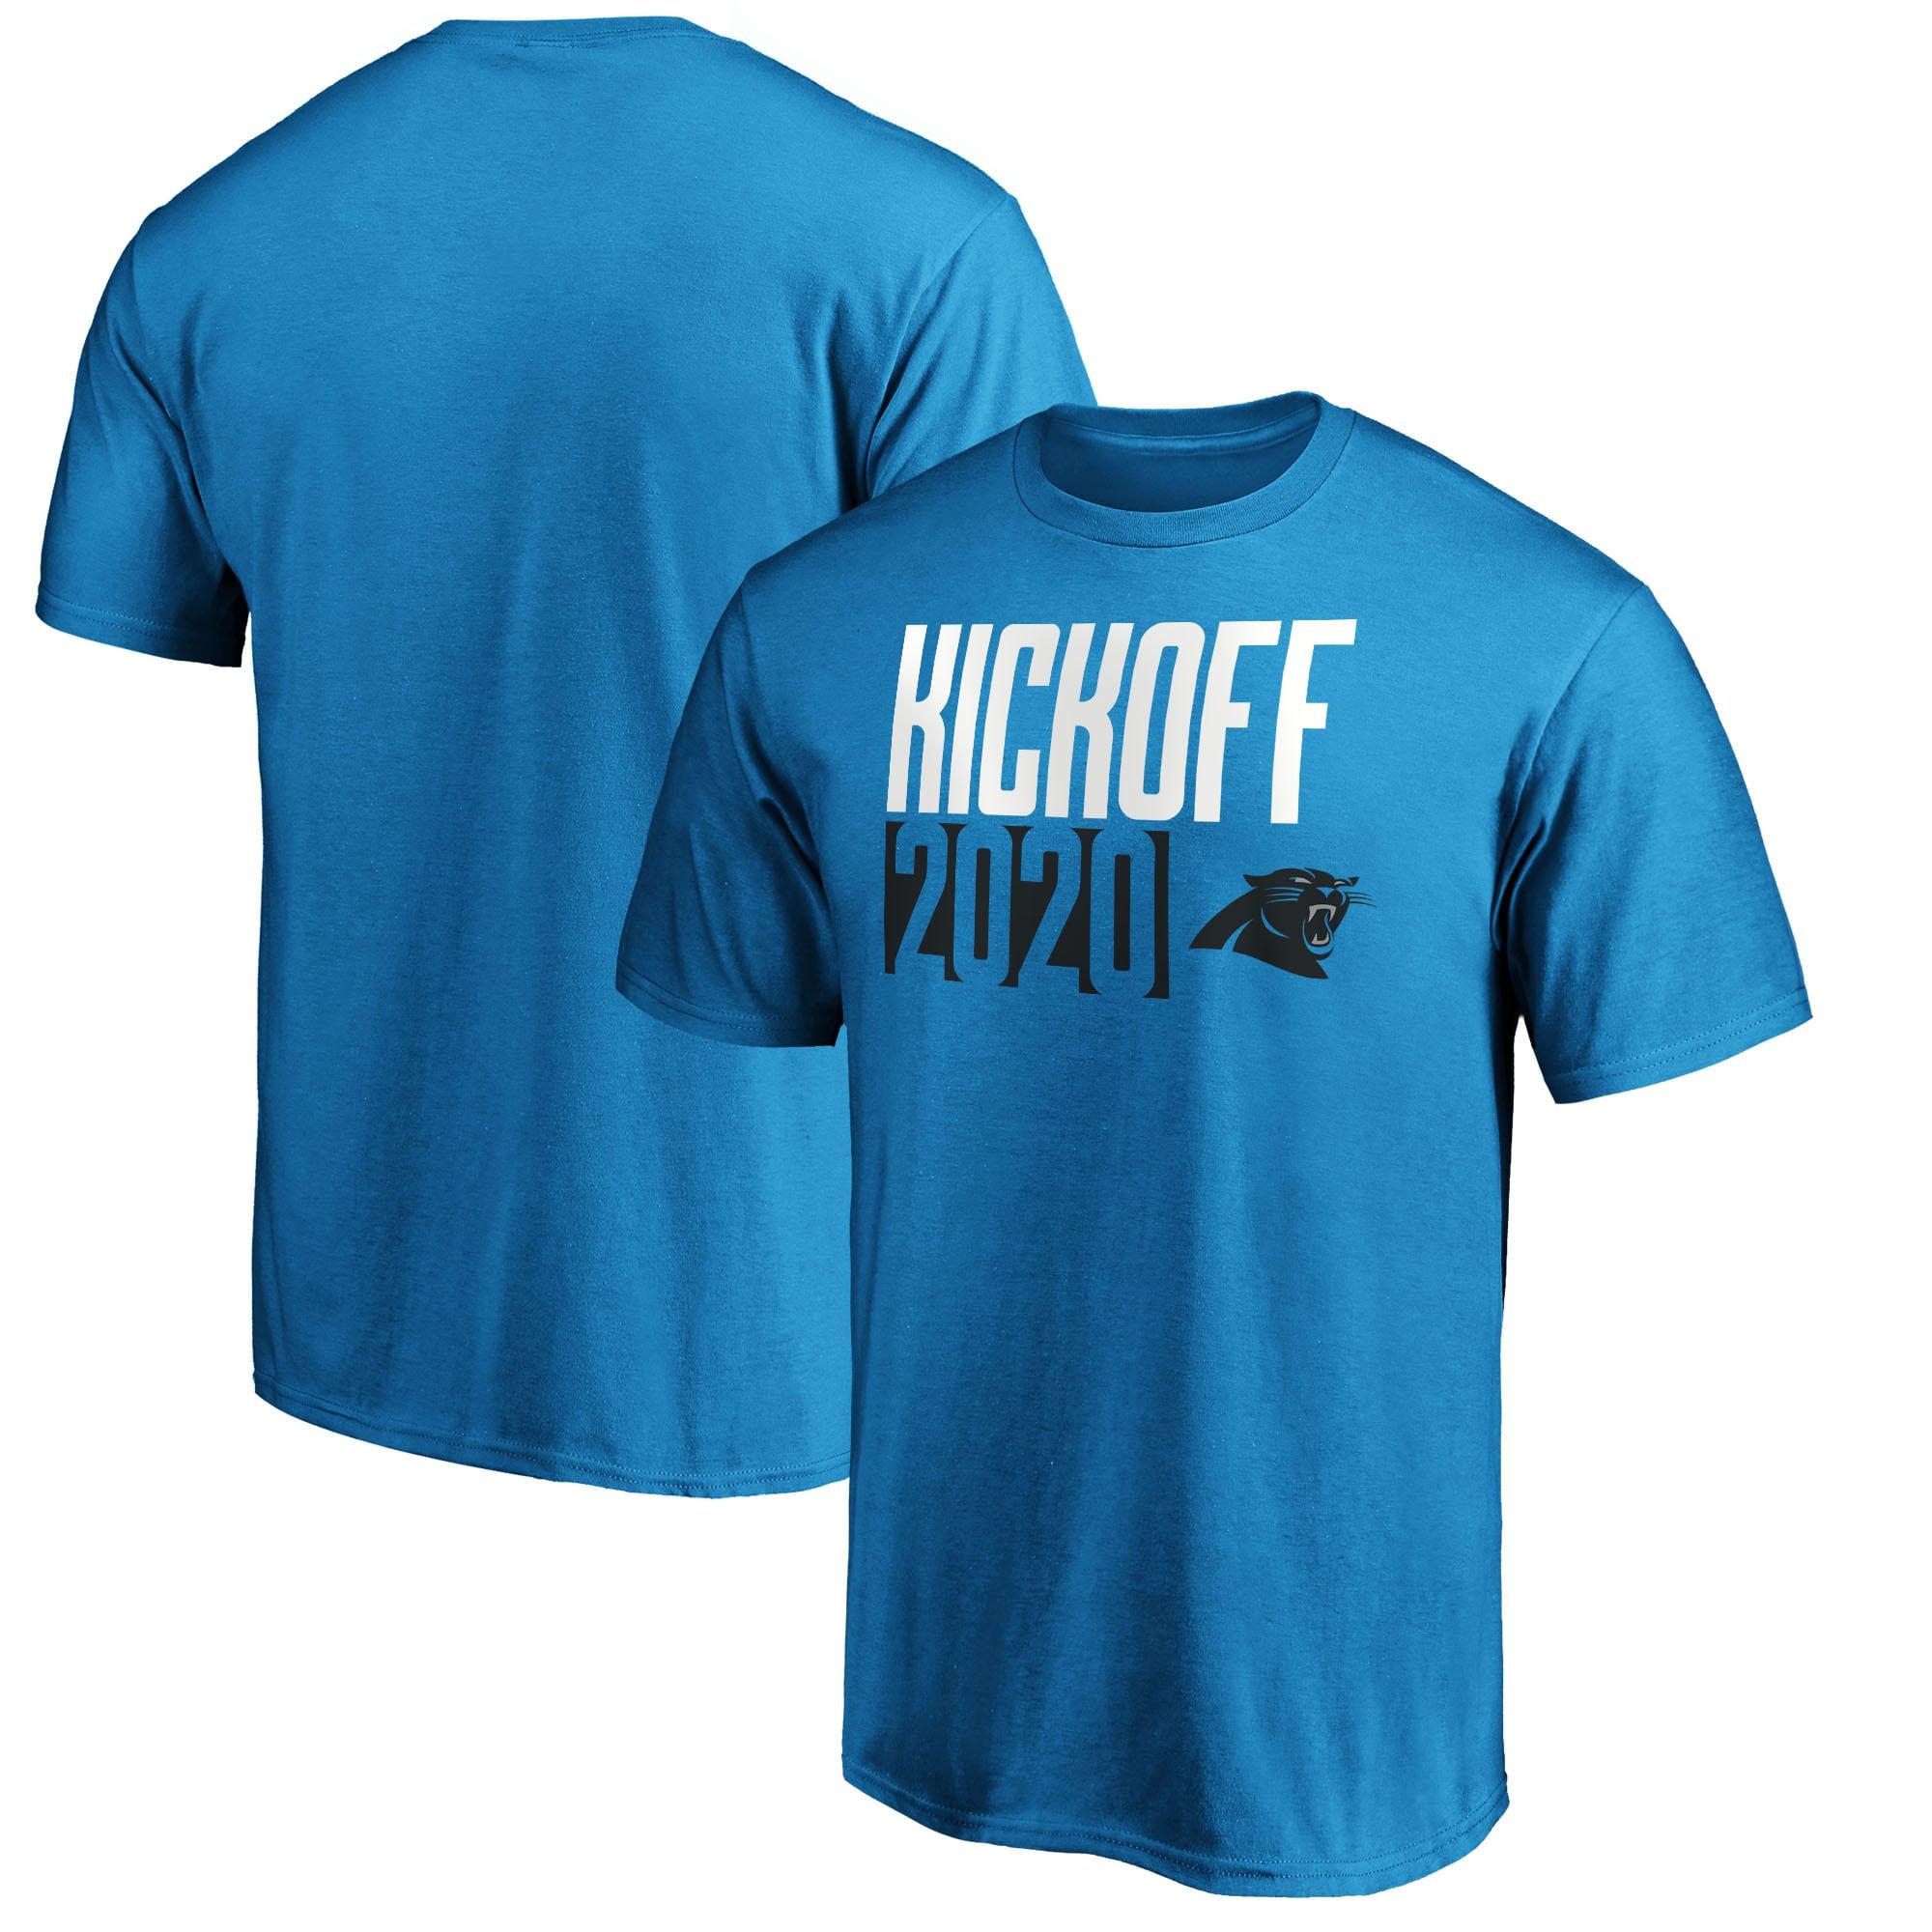 Carolina Panthers Fanatics Branded Kickoff 2020 T-Shirt - Blue